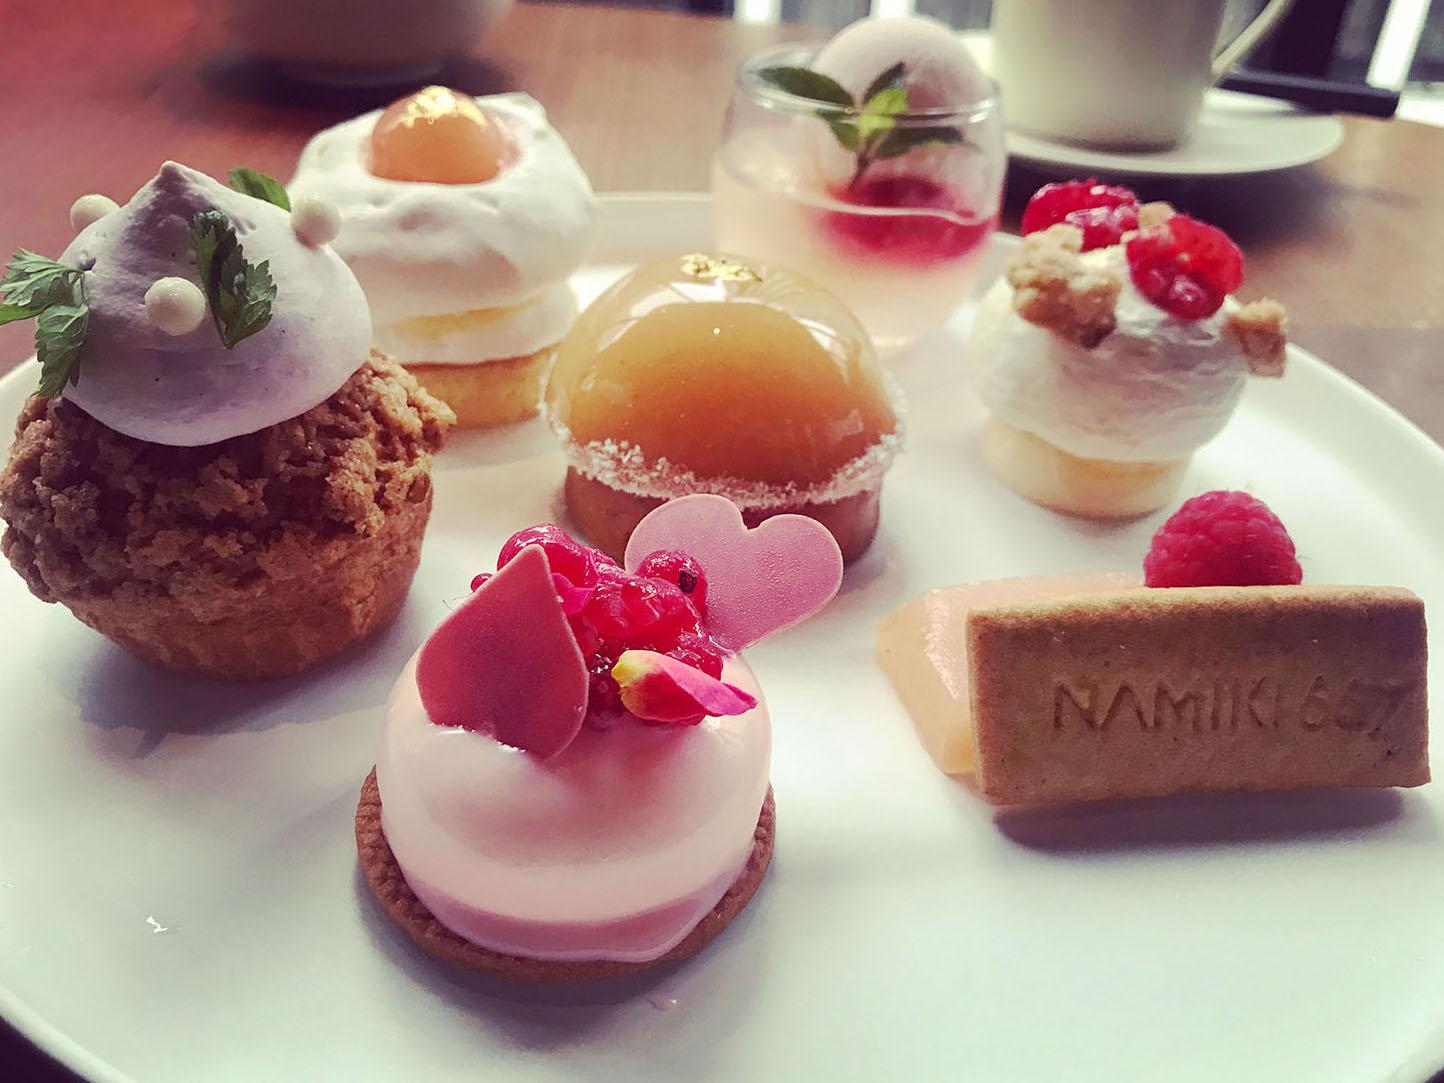 NAMIKI667のPeach Cake Set(アップ)